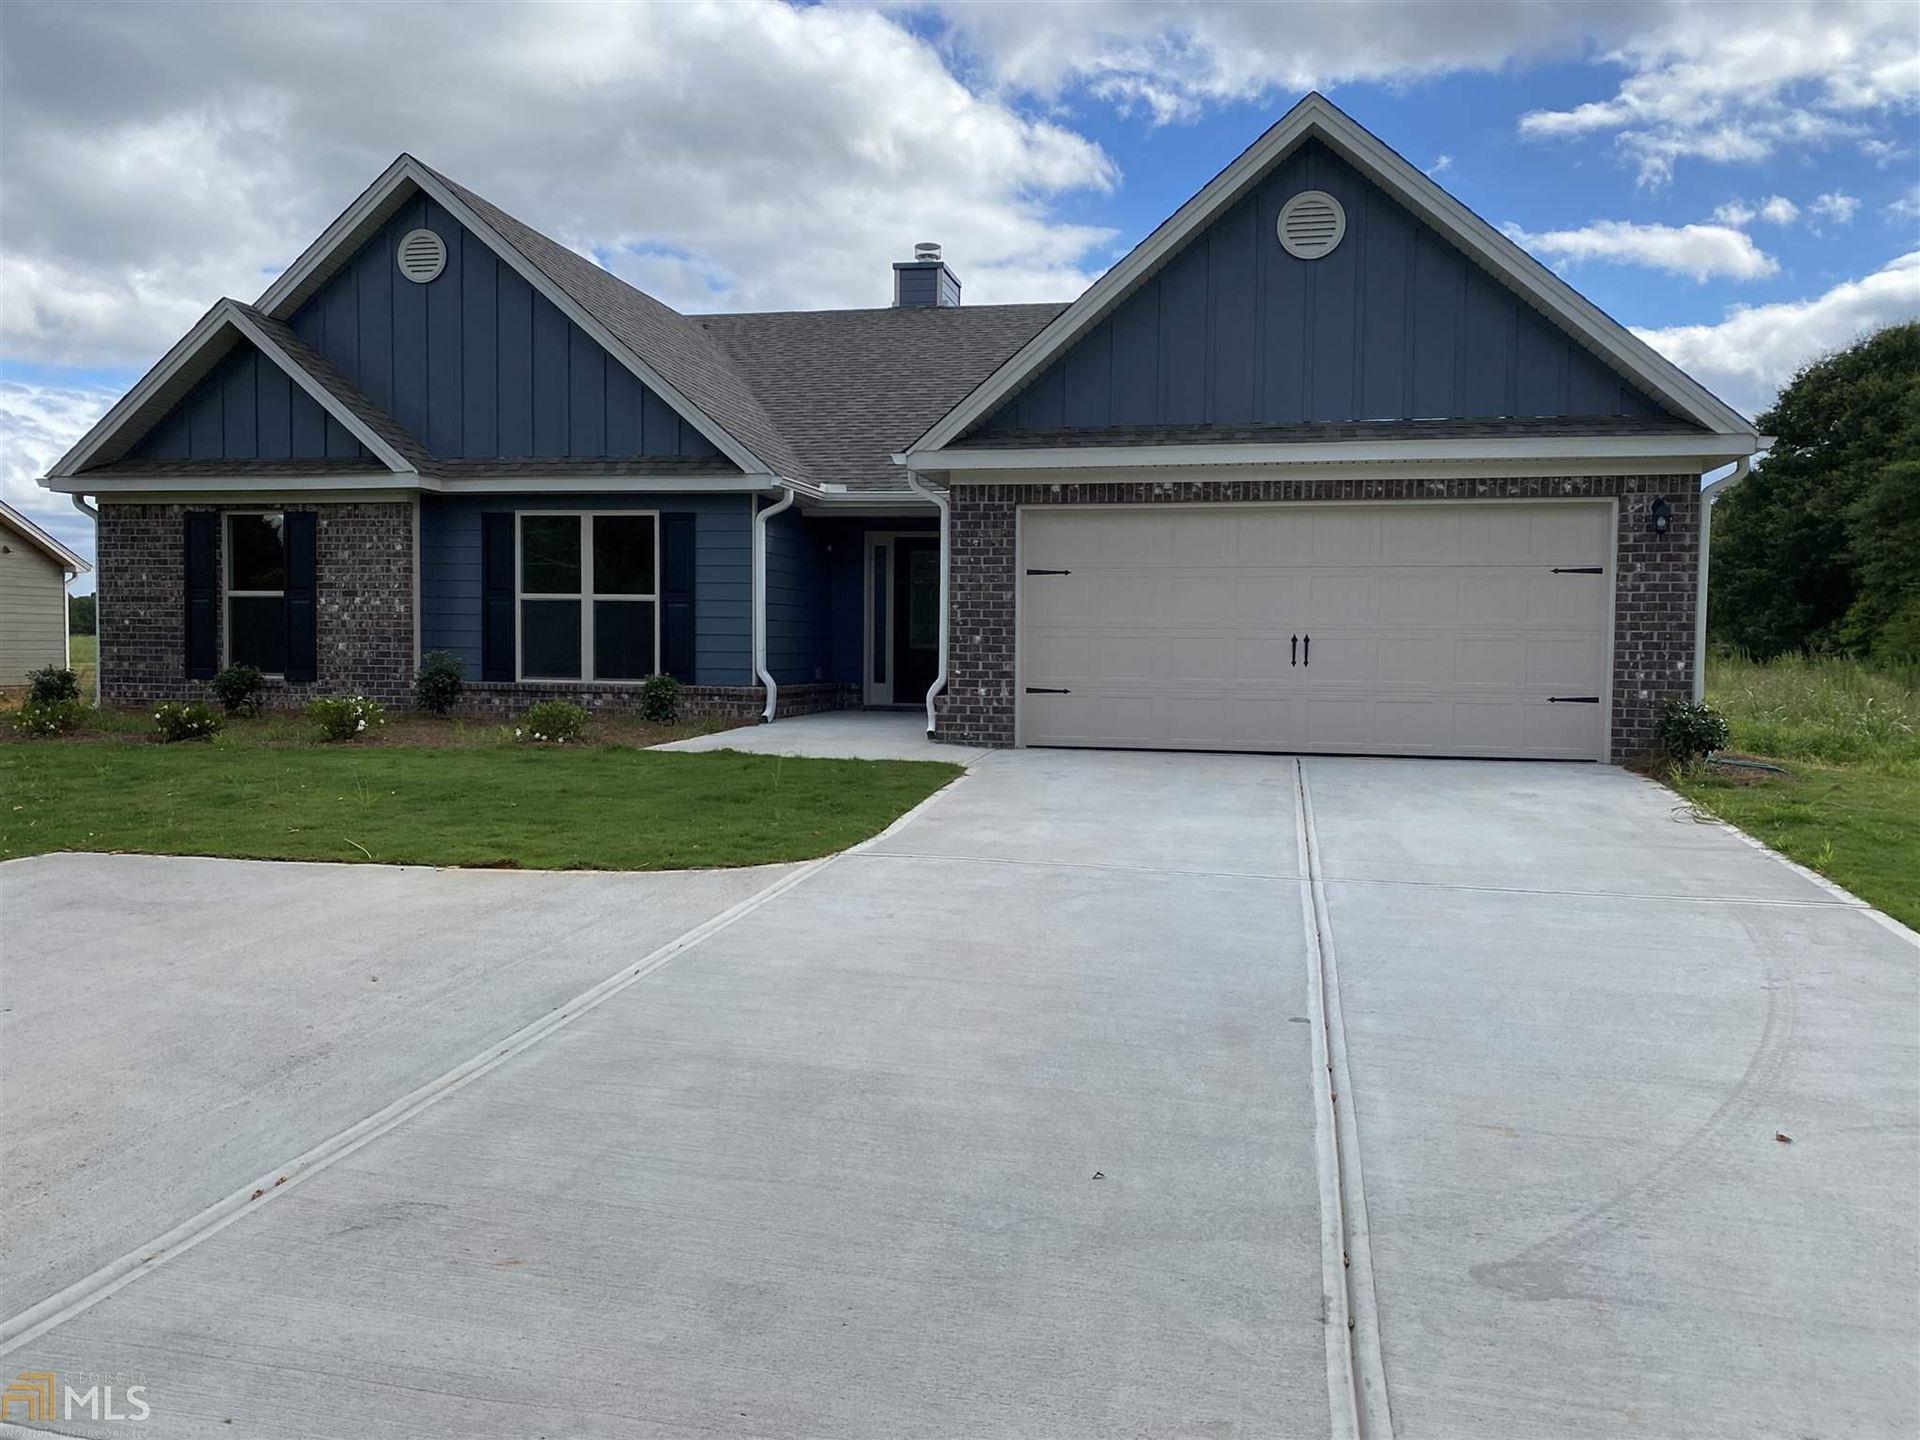 1345 Perkins Rd, Winder, GA 30680 - #: 8805478